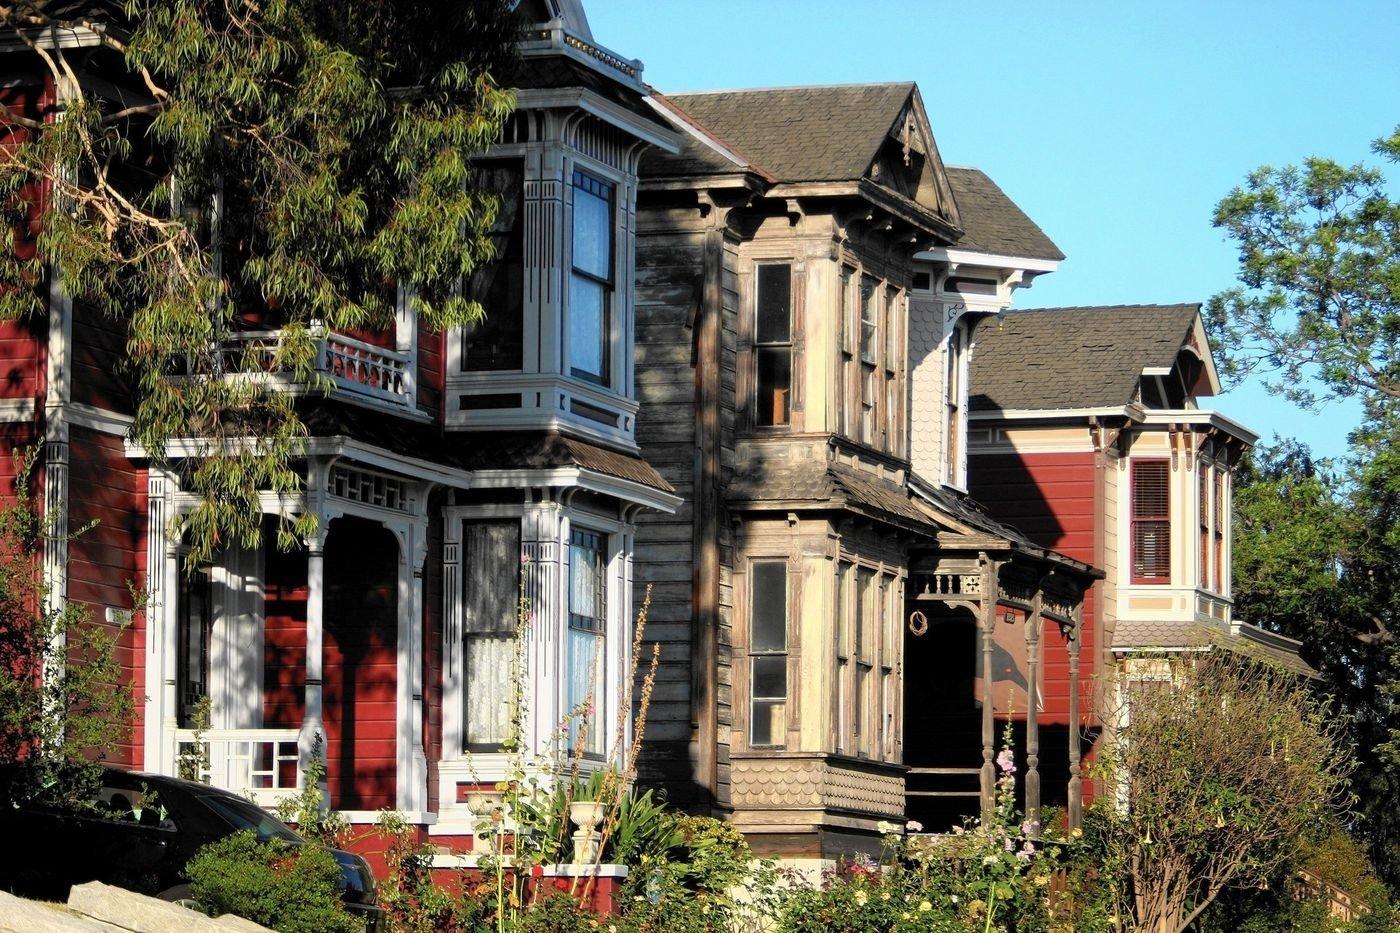 10 Fantastic Is Reverse Mortgage A Good Idea a reverse mortgage might be a good idea for some older homeowners 2020